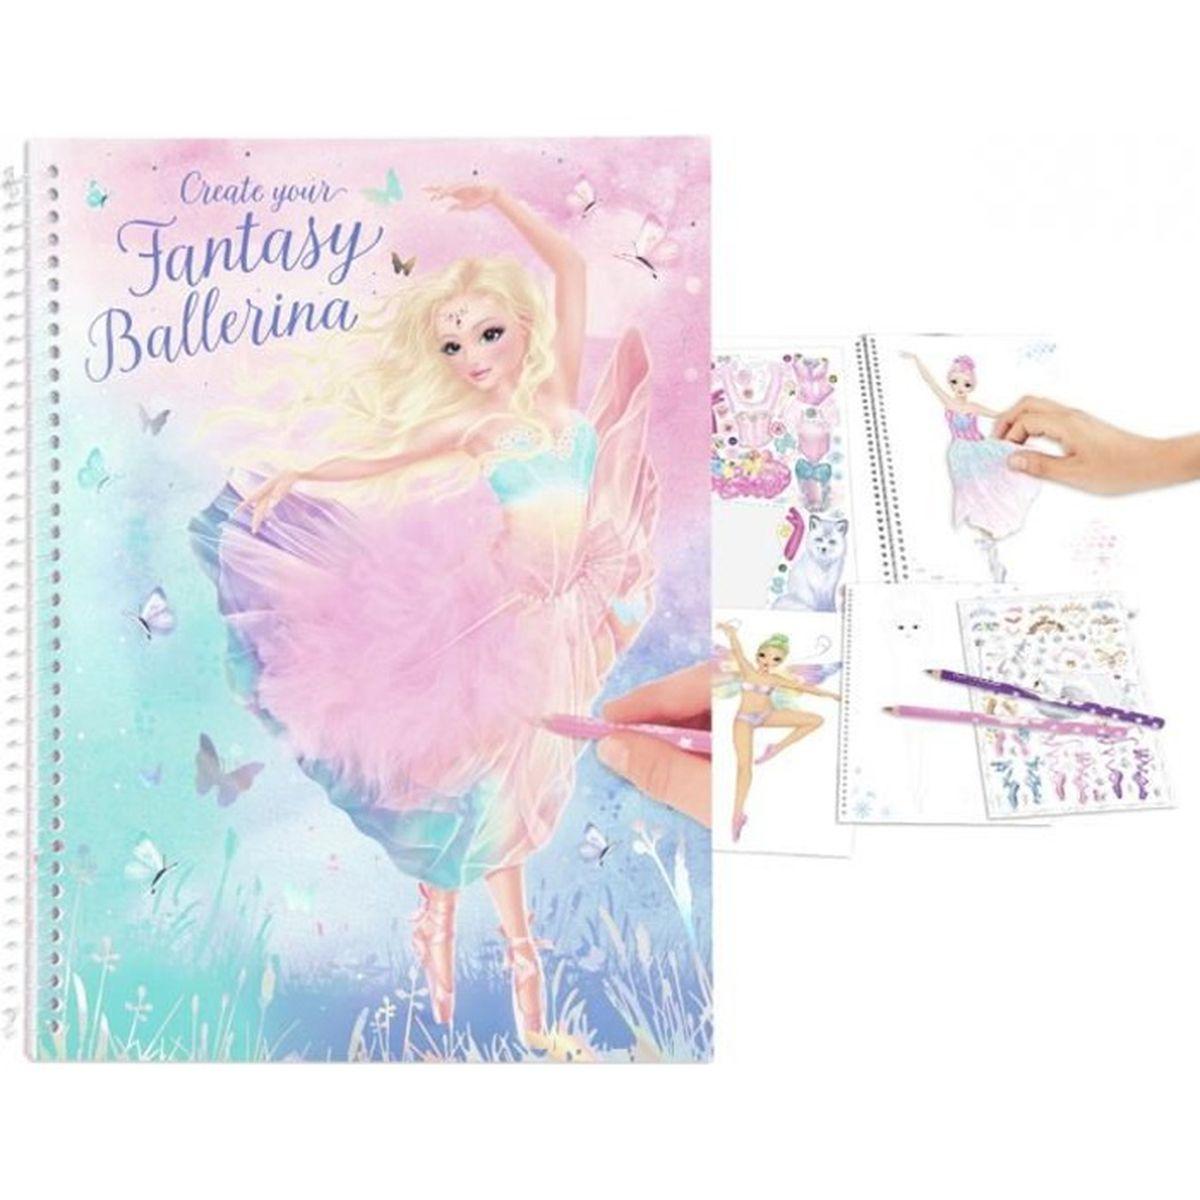 Album Coloriage Et Creation Topmodel Fantasy Ballerina Achat Vente Livre De Coloriage Cdiscount